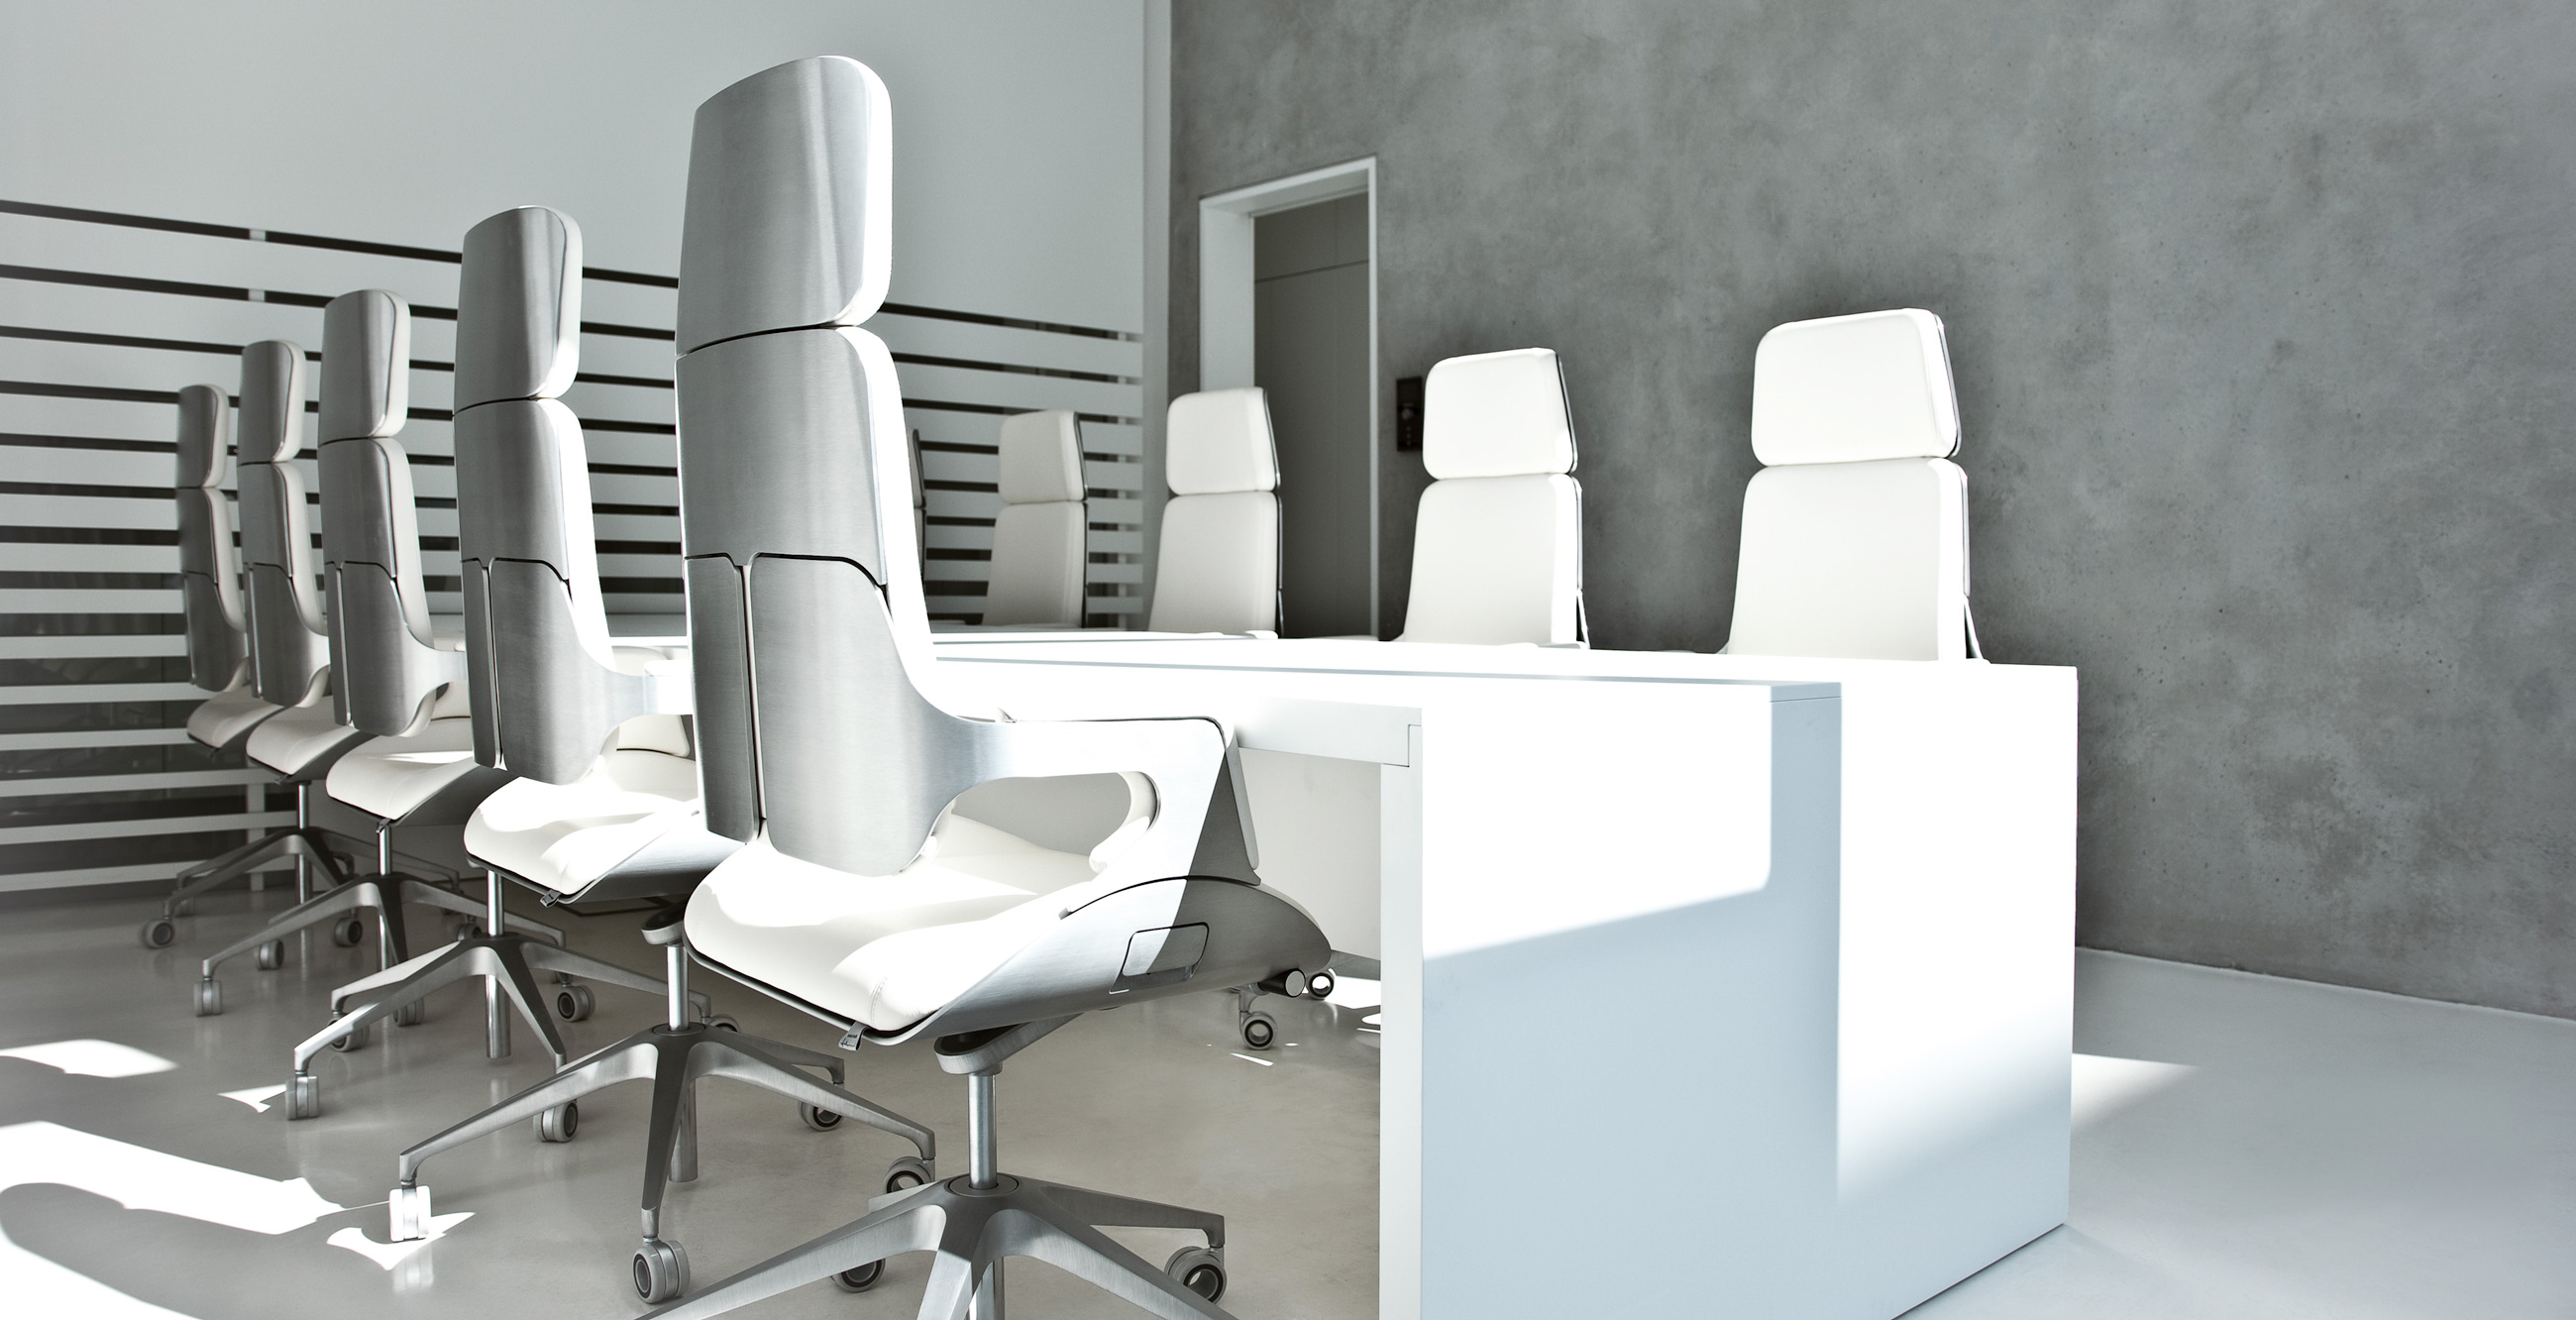 Interstuhl Silver Executive Highback Office Chair 362S Brushed Aluminium In Situ